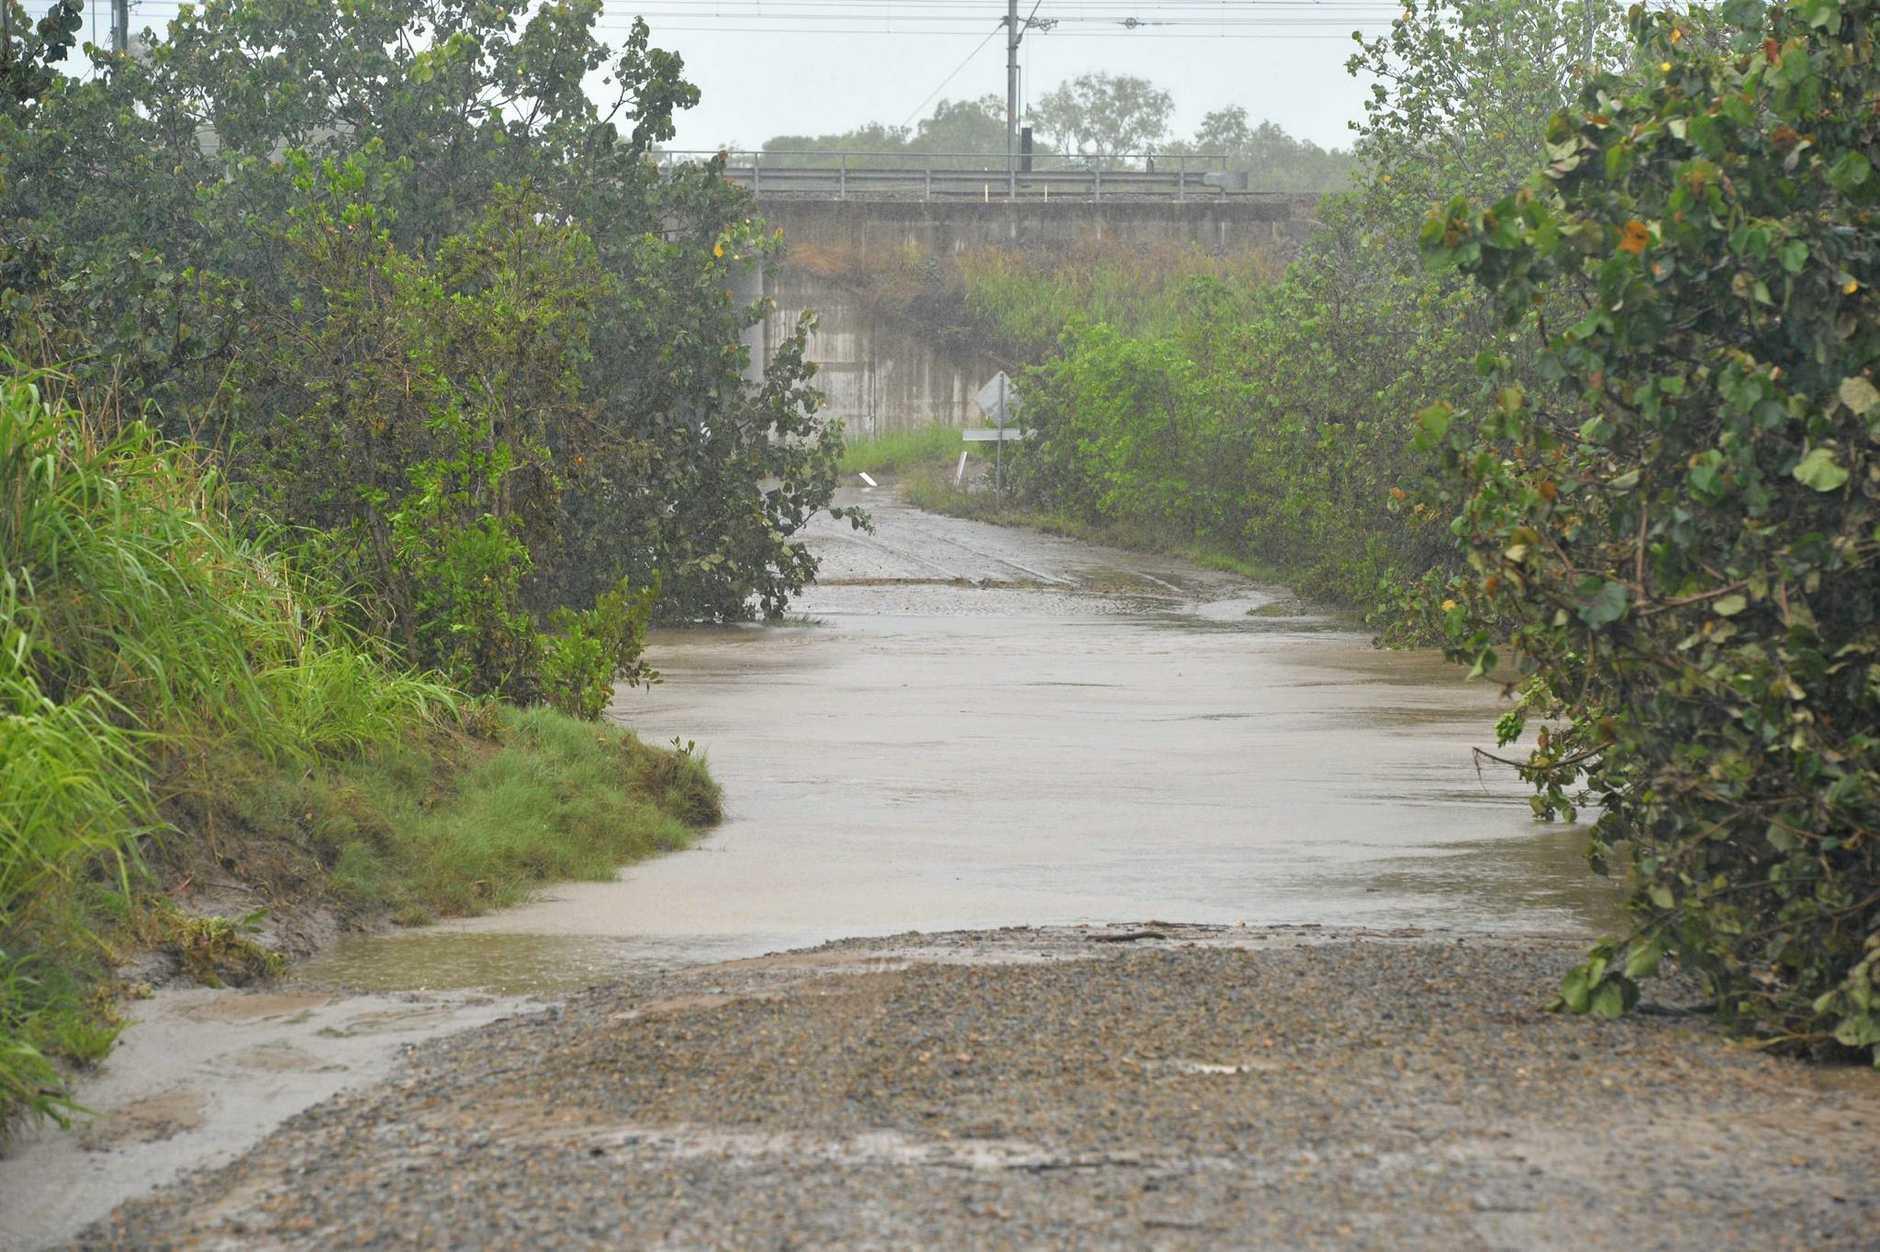 Water covers the bitumen at Brooks Road, Sarina.